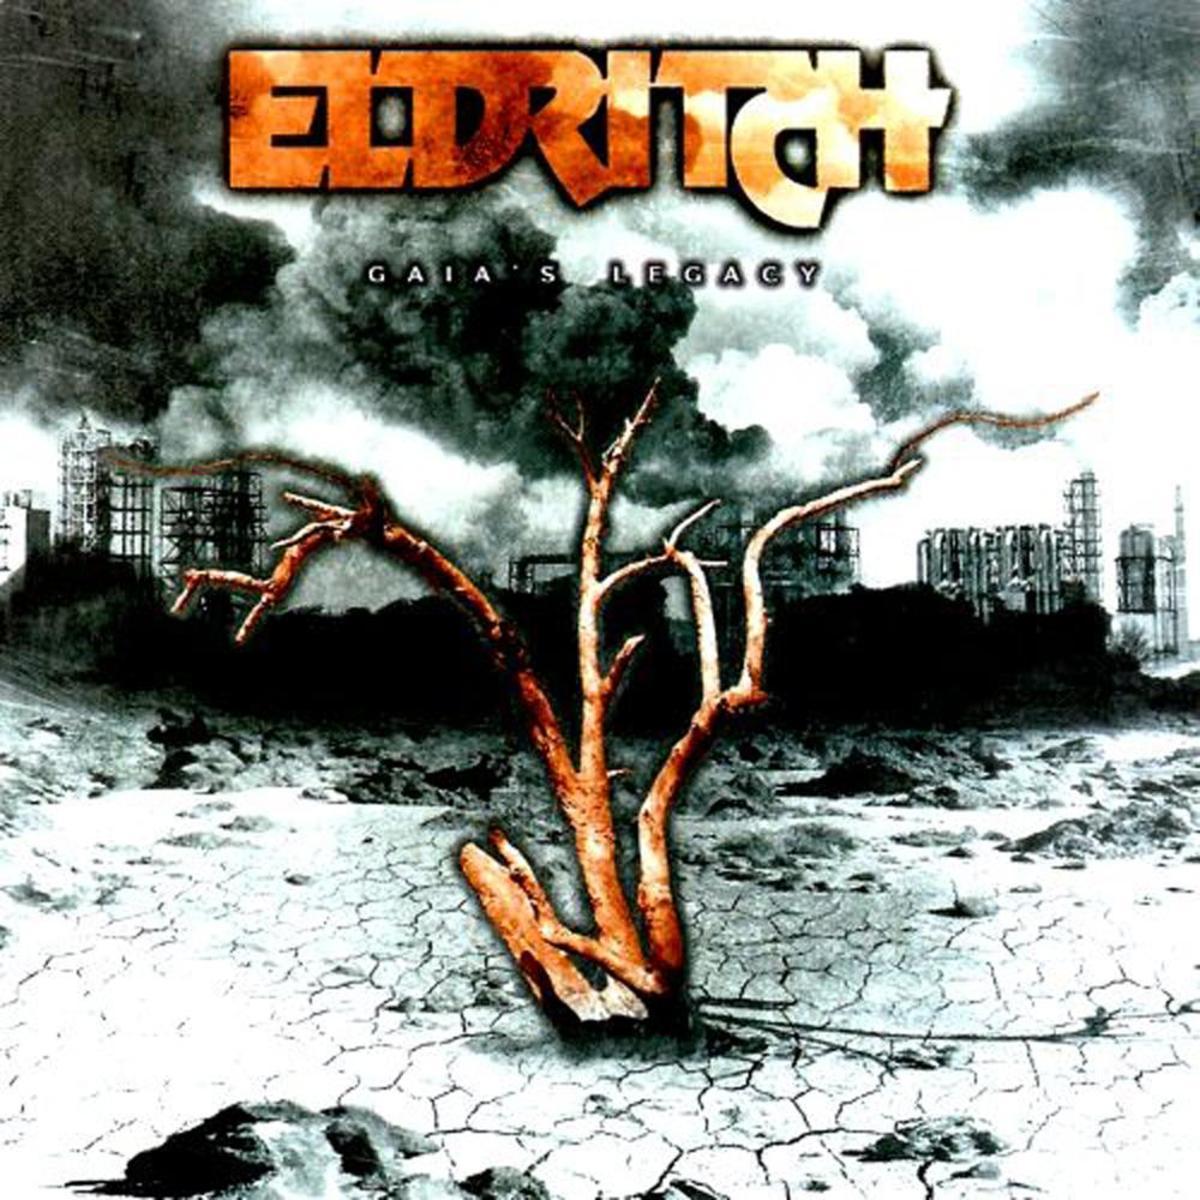 Review : the Album Gaia's Legacy by Italian Progressive Thrash Metal Band Eldritch